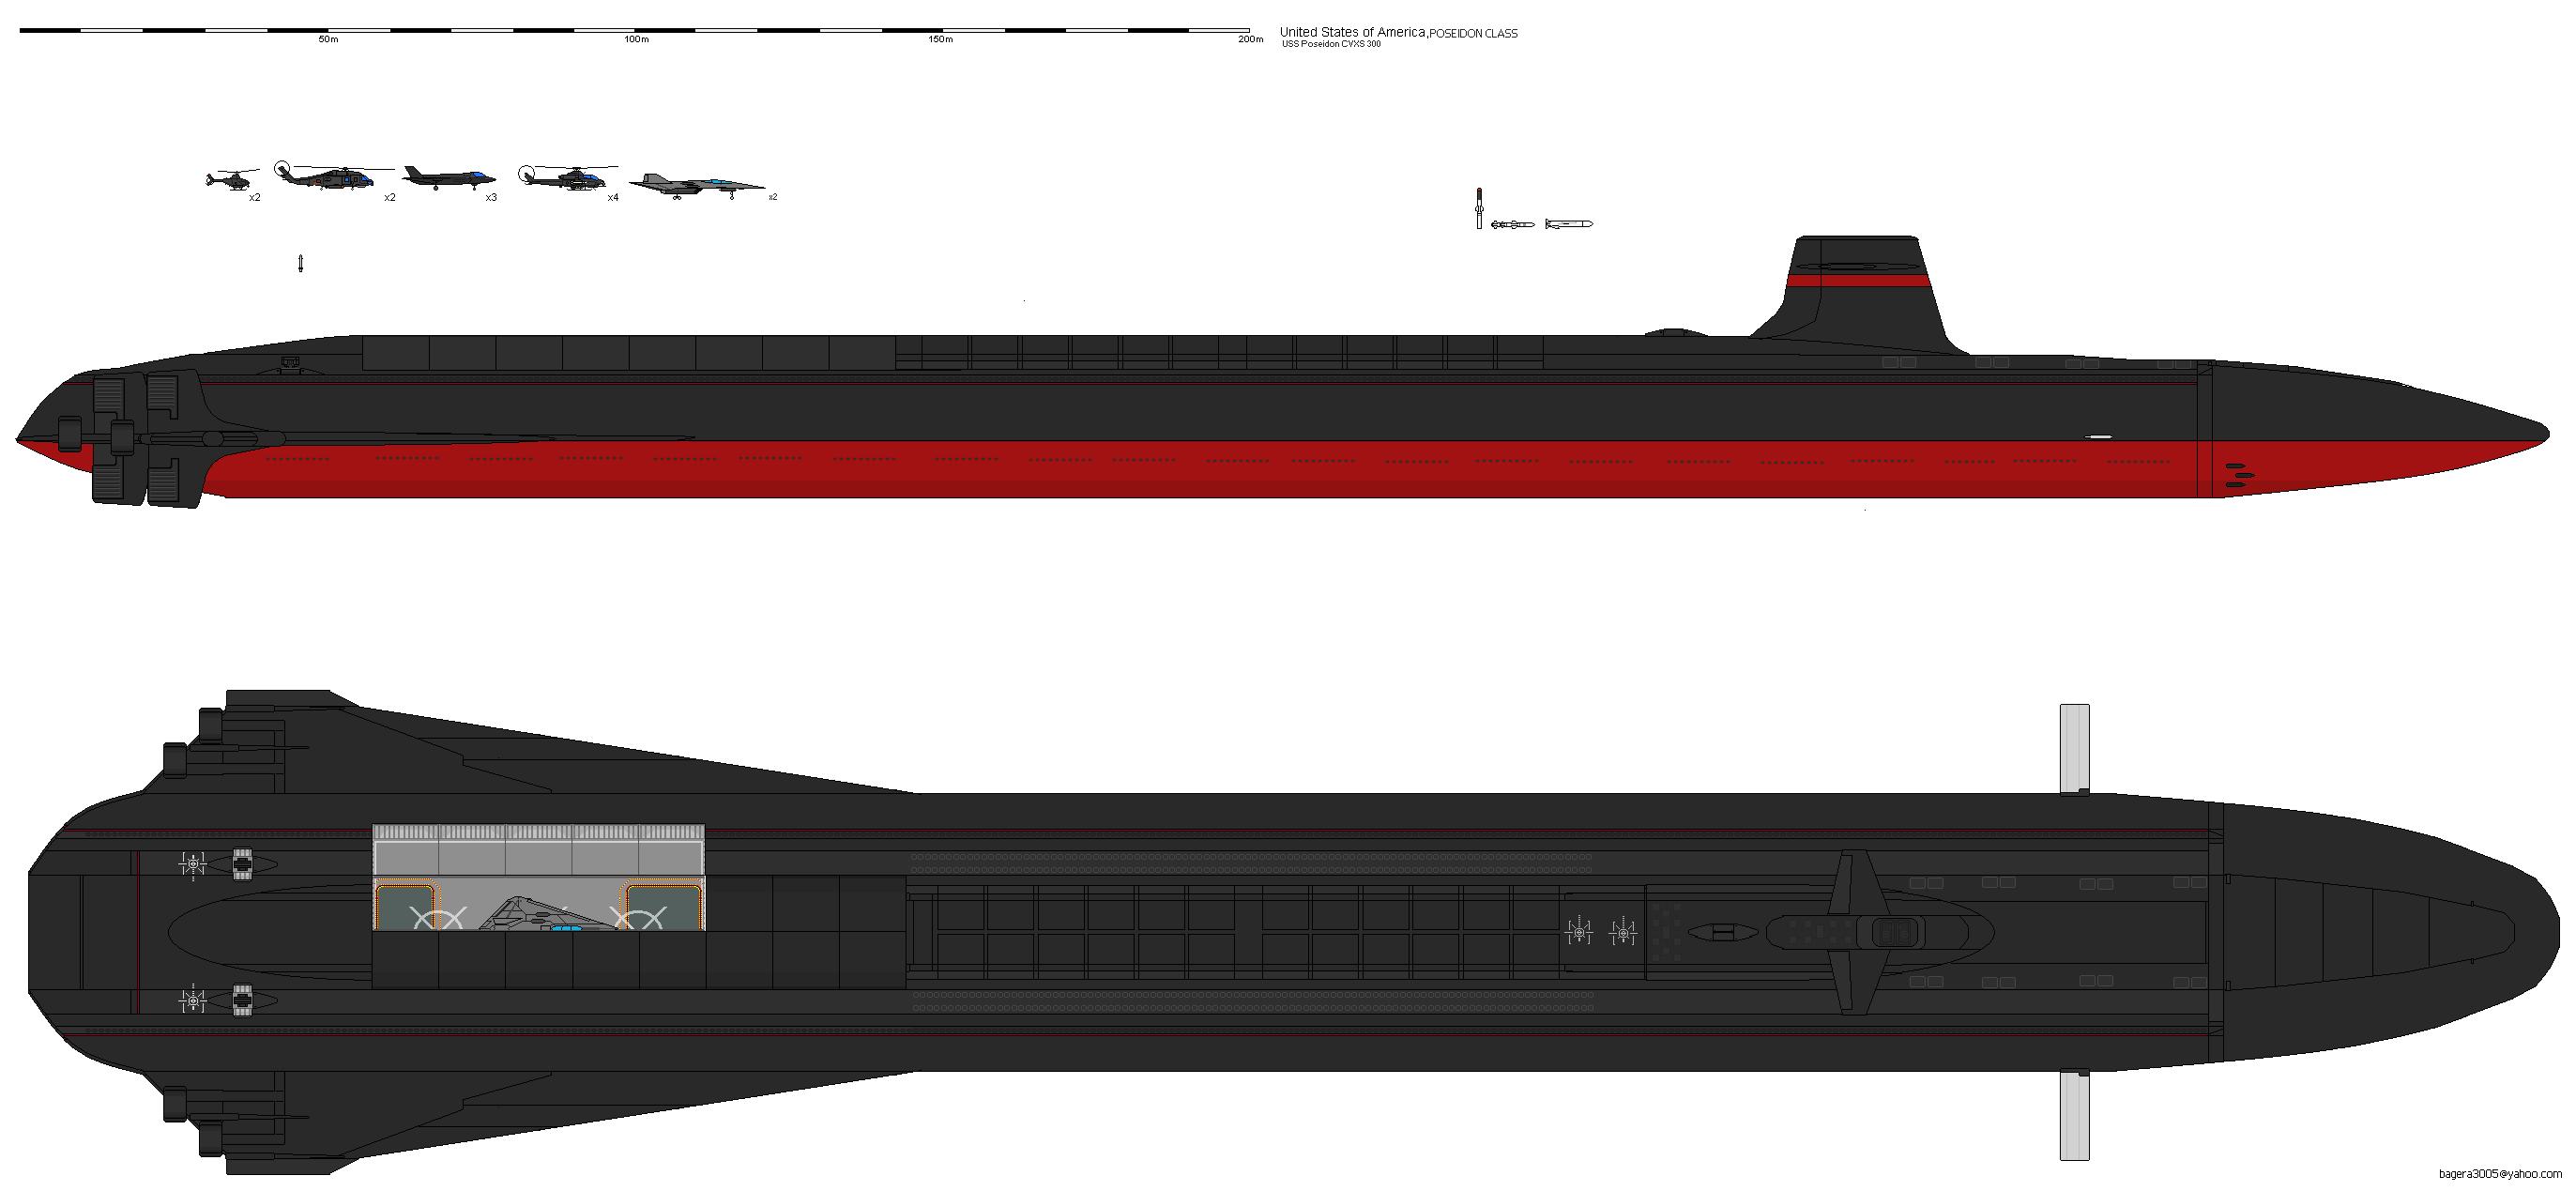 Rufetic Federation Armed Forces D2ik4kr-f8c4c085-1780-4f50-84c5-a31fbf38cd62